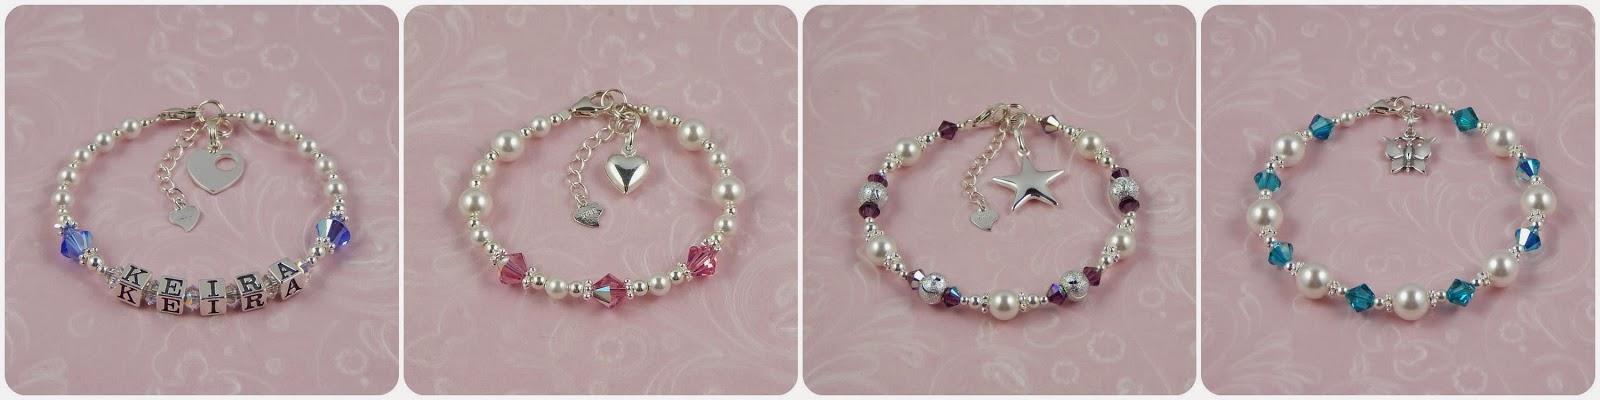 Birthstone jewellery range